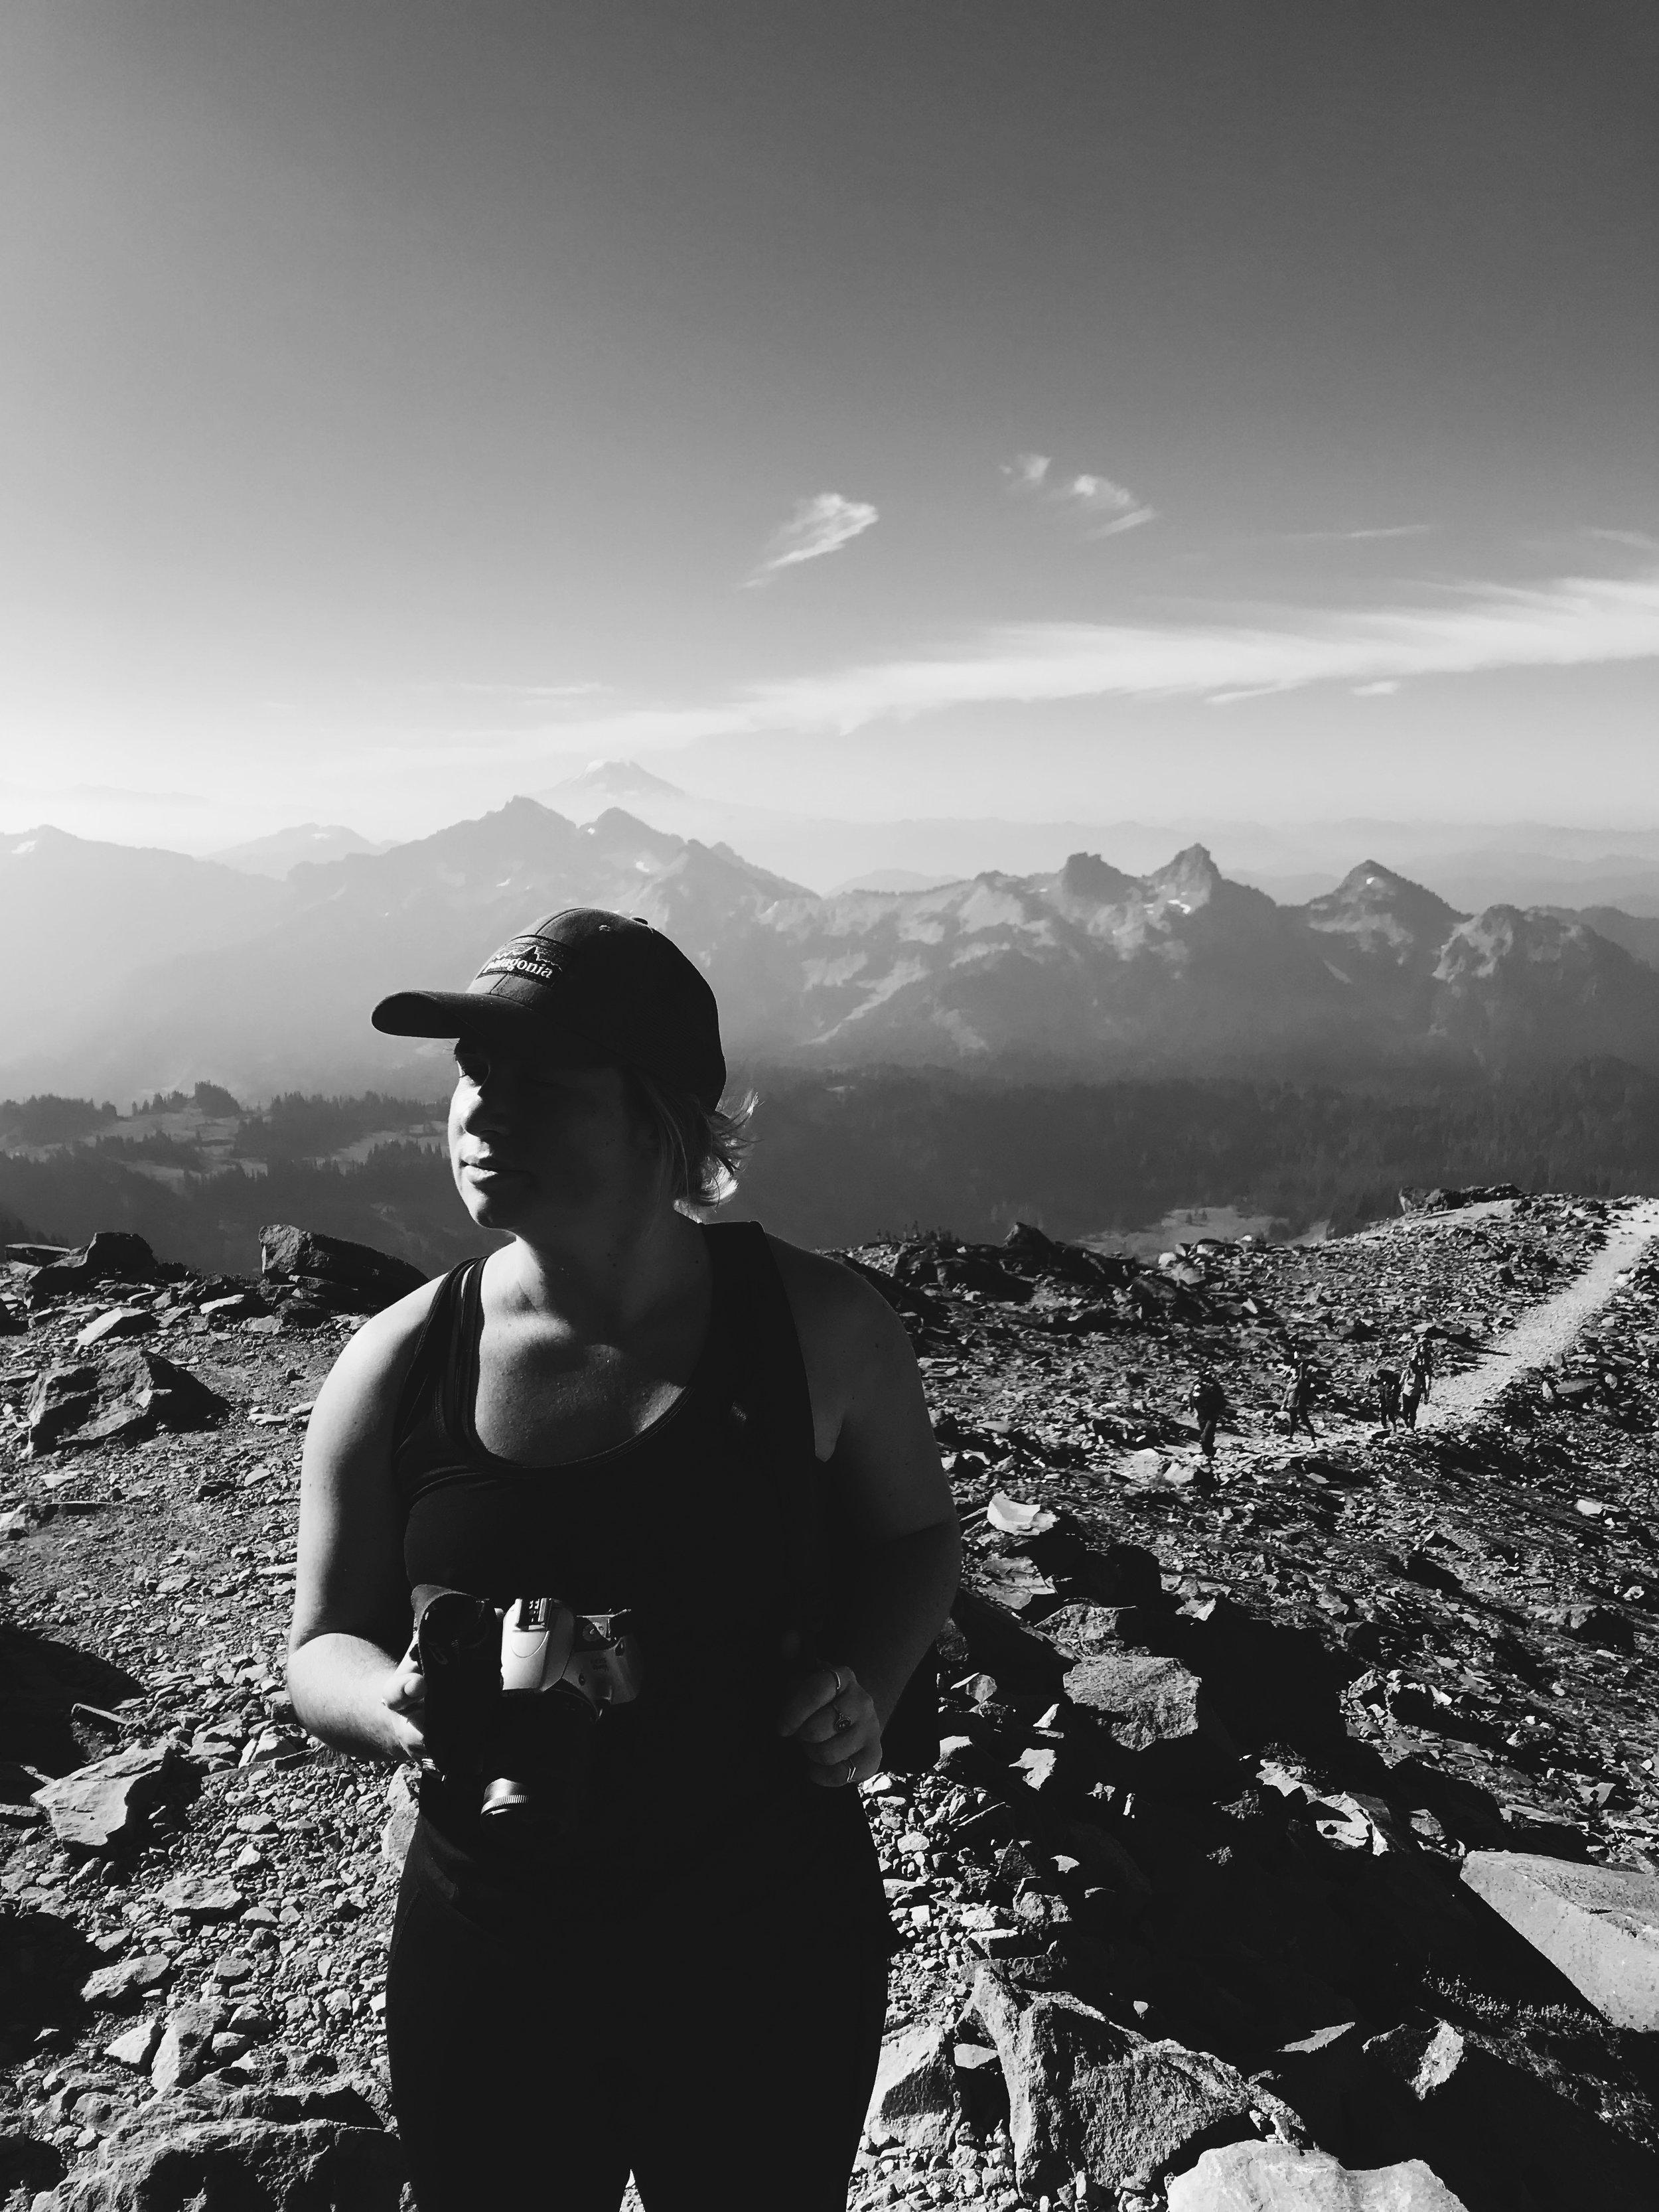 My best gal, Jan on top of Mt. Rainier, WA.